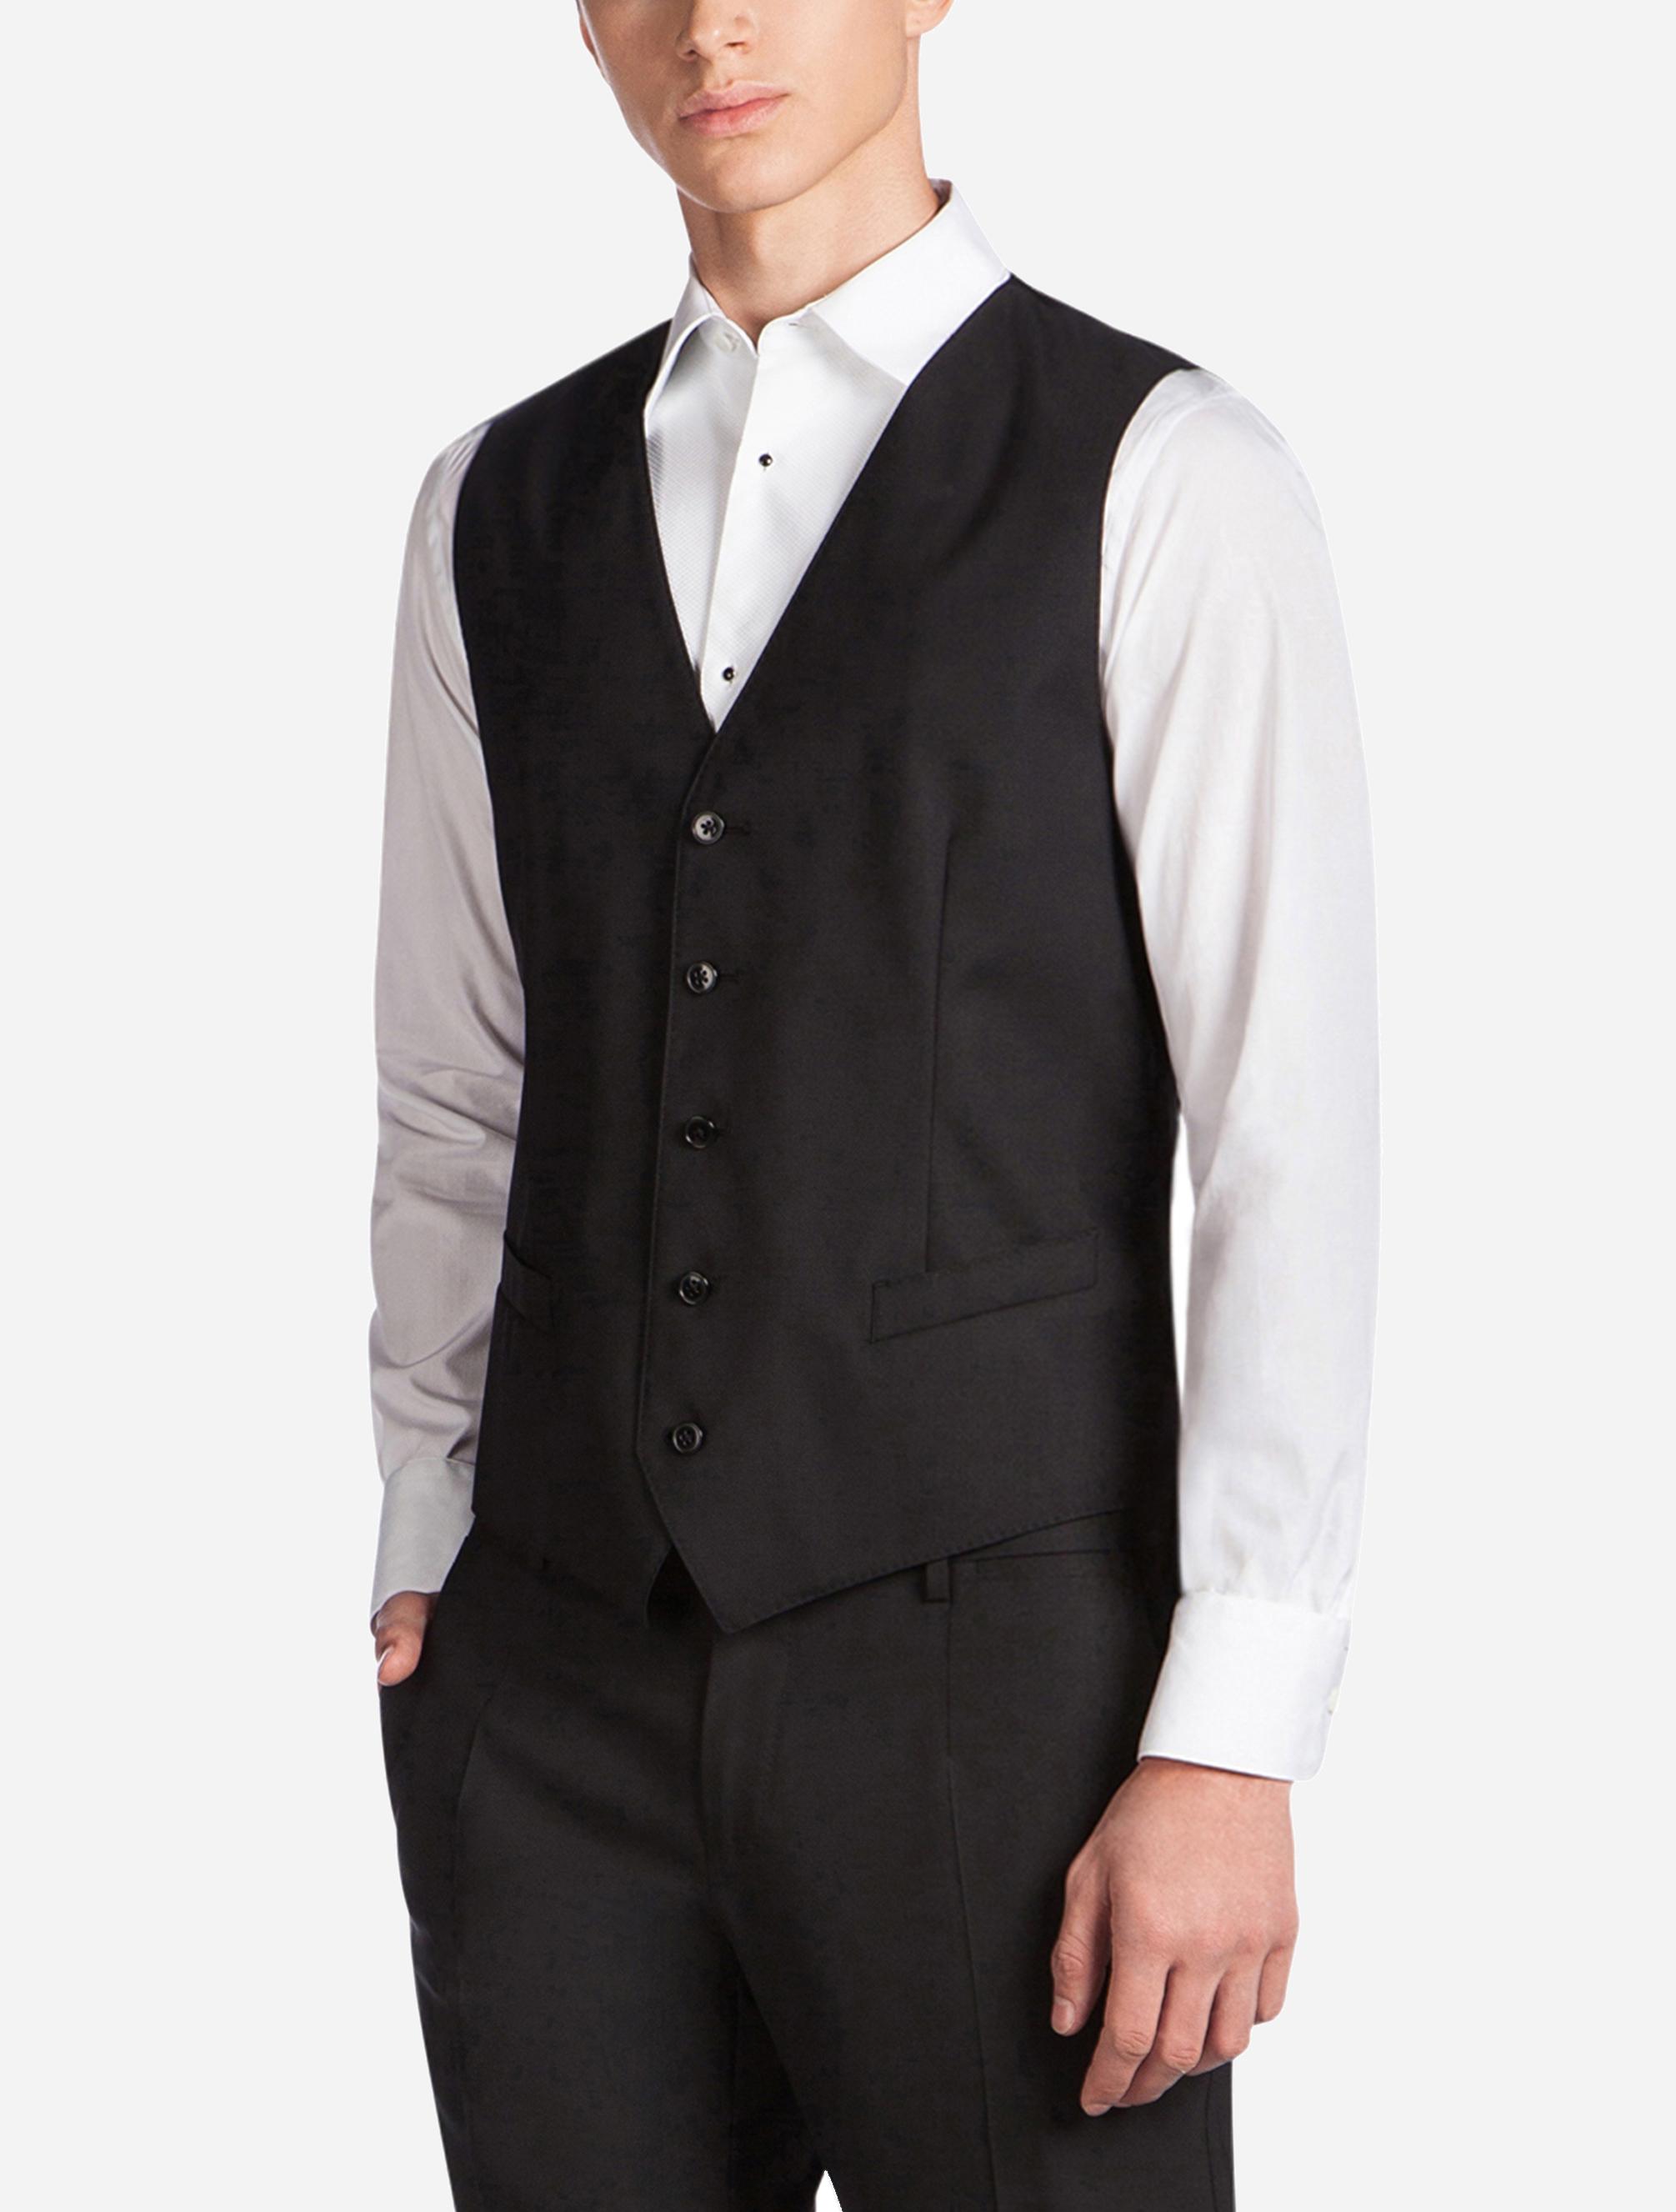 Dolce&Gabbana FIVE BUTTON VEST IN WOOL